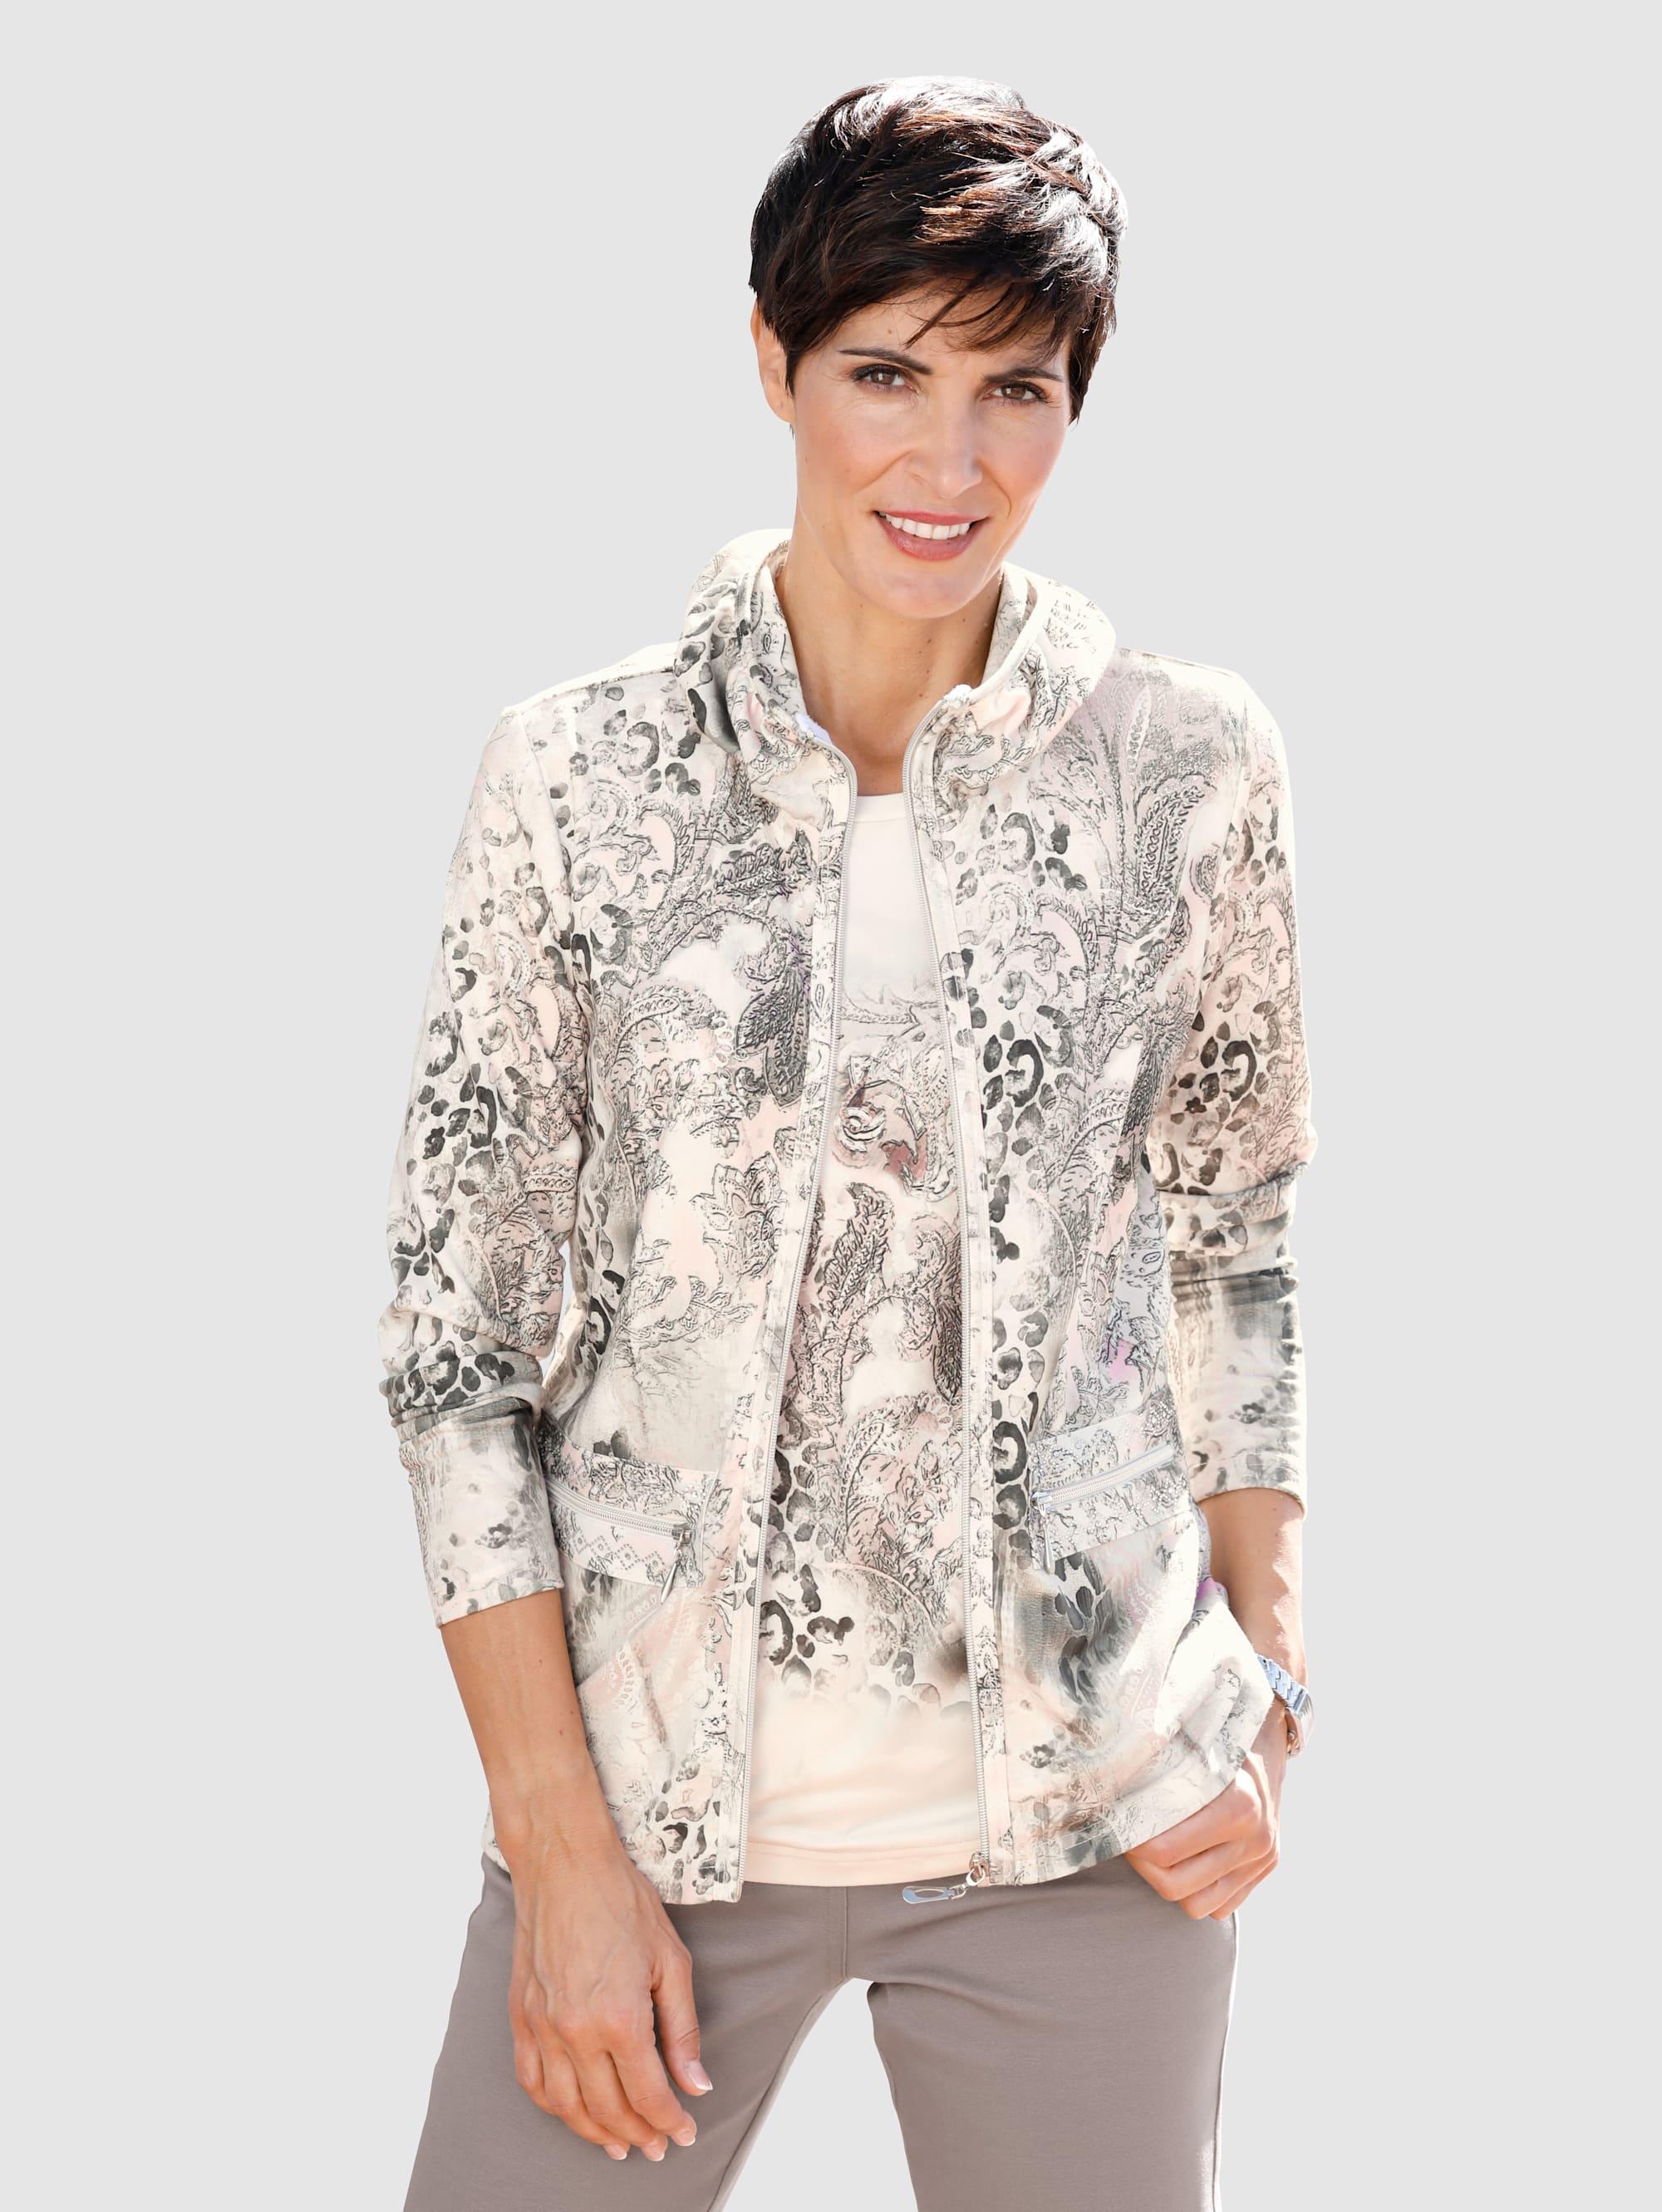 Paola Shirt mit Druckmotiv im Vorderteil sxQZ1 hePLy